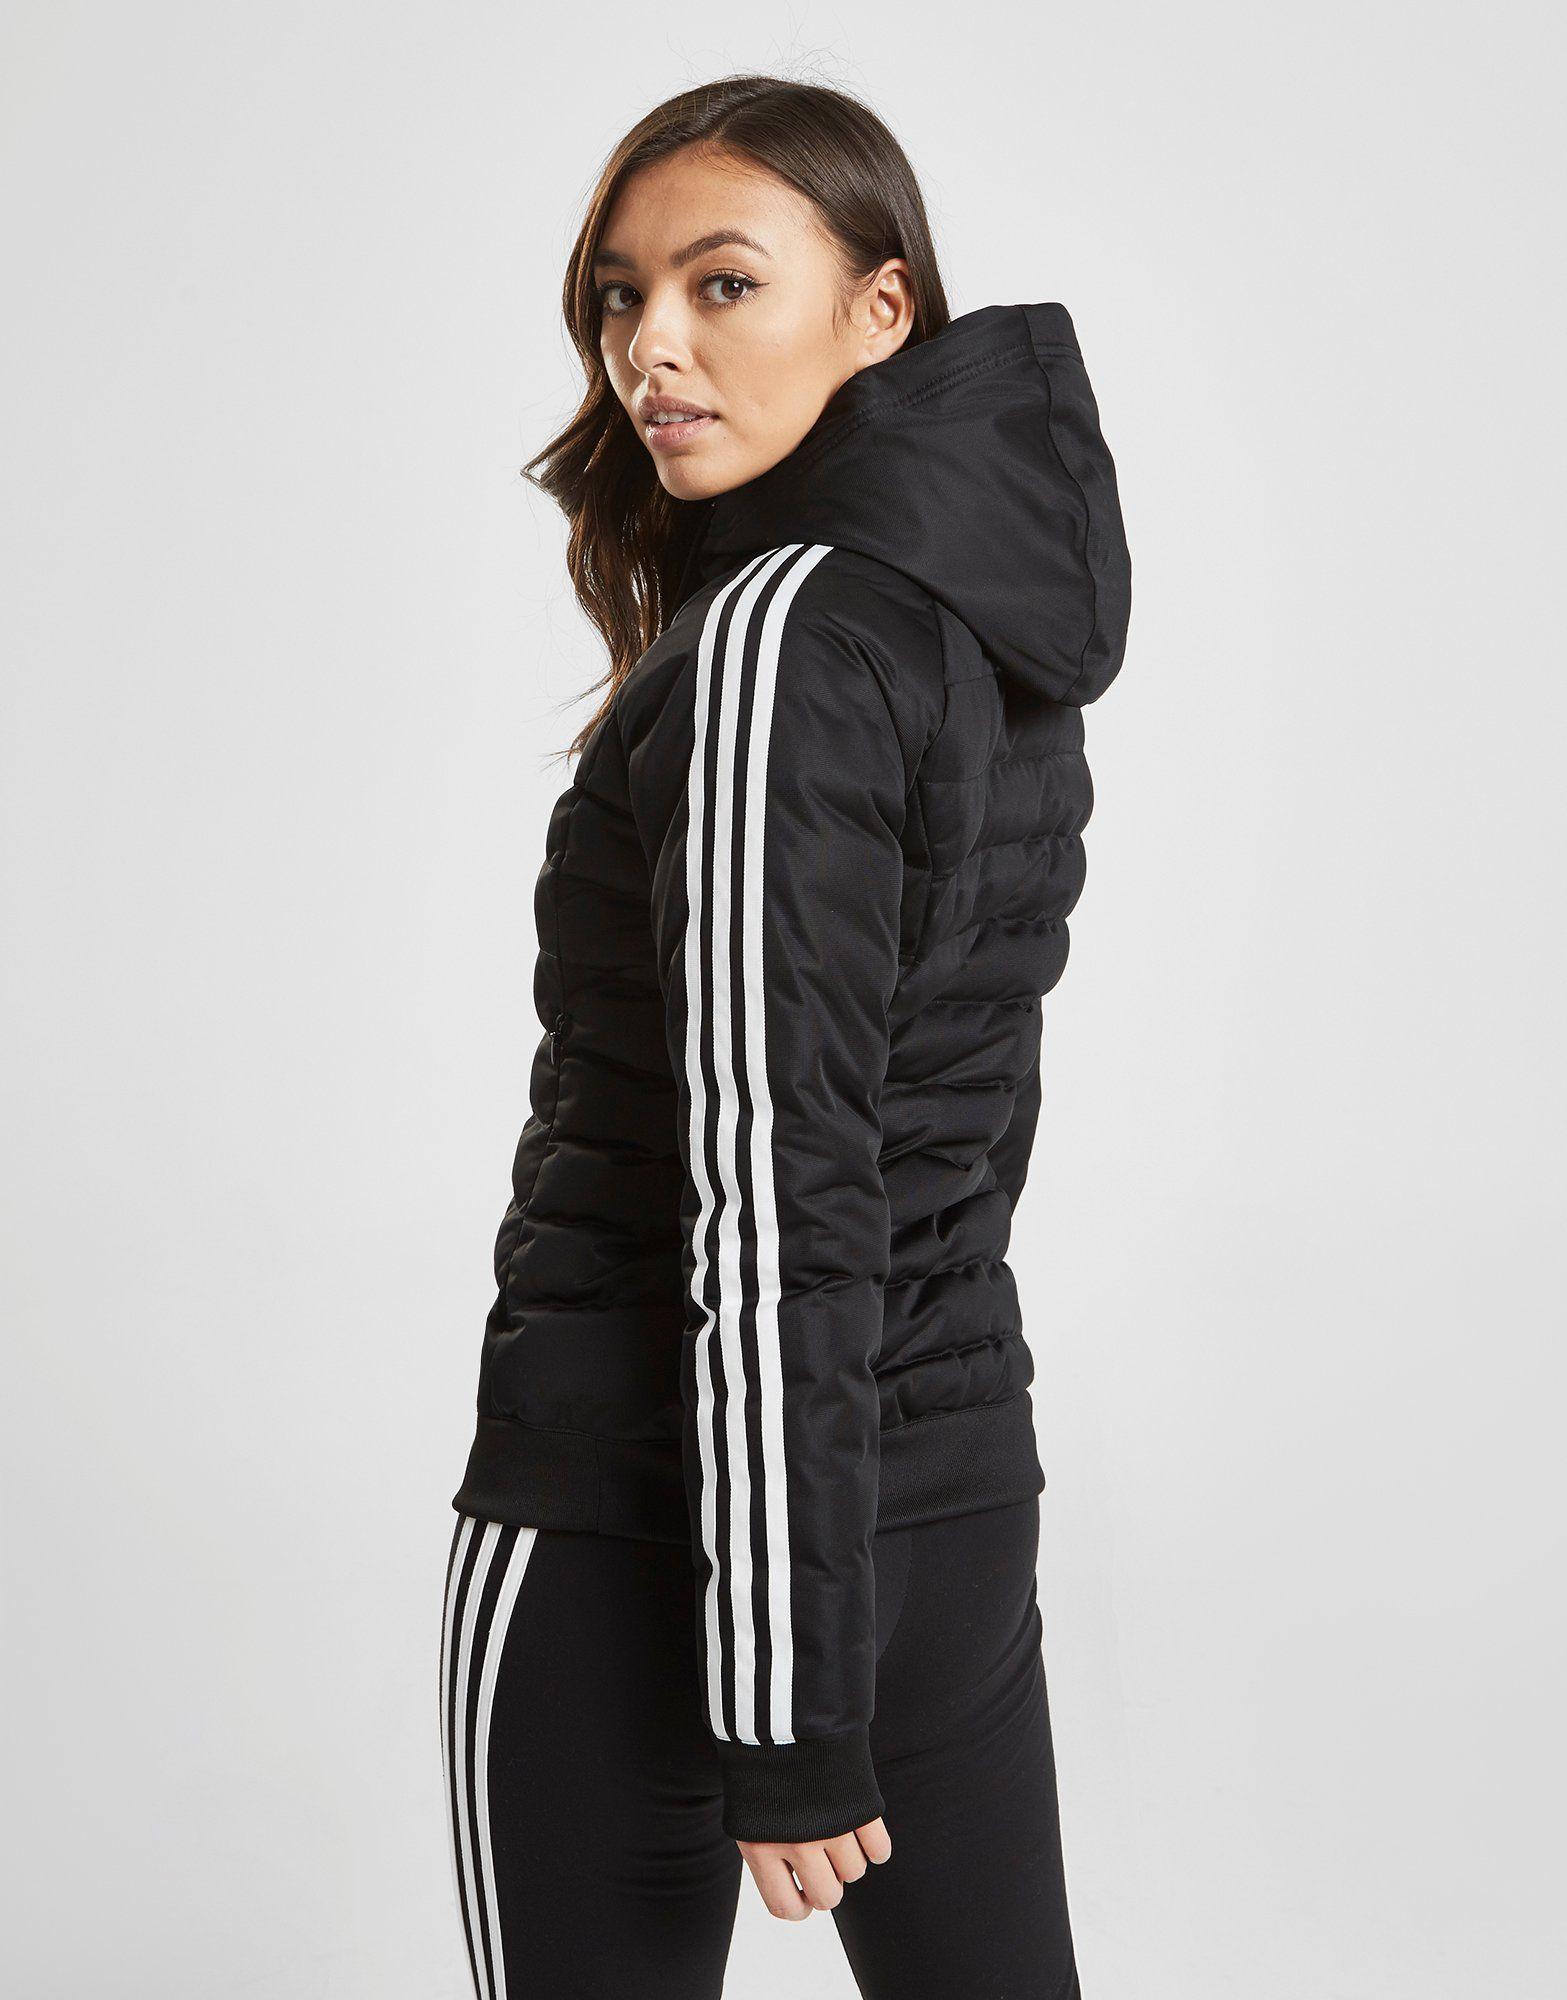 adidas Originals chaqueta 3-Stripes Padded